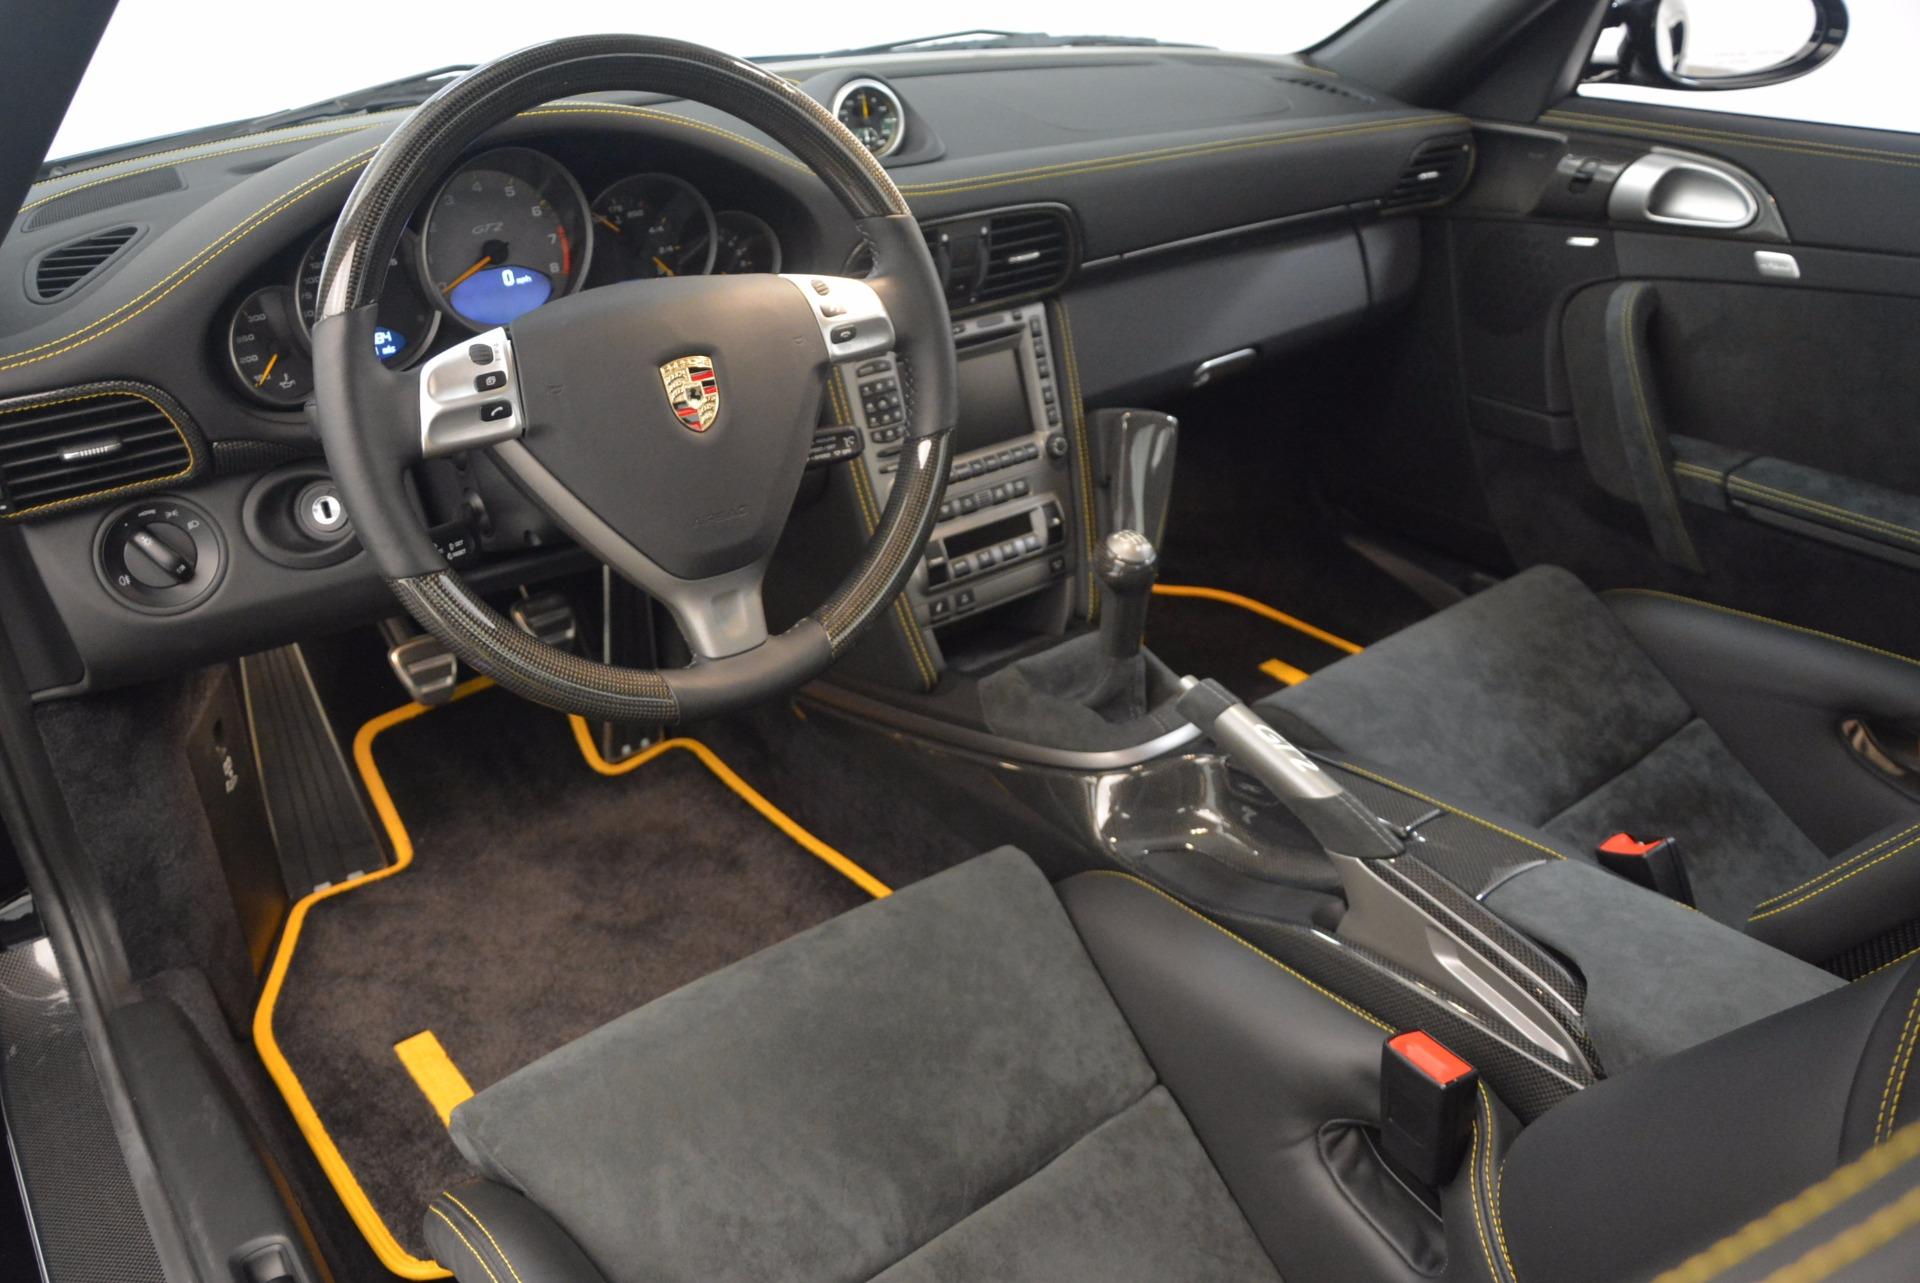 Used 2008 Porsche 911 GT2 For Sale In Greenwich, CT. Alfa Romeo of Greenwich, 7239 1400_p13